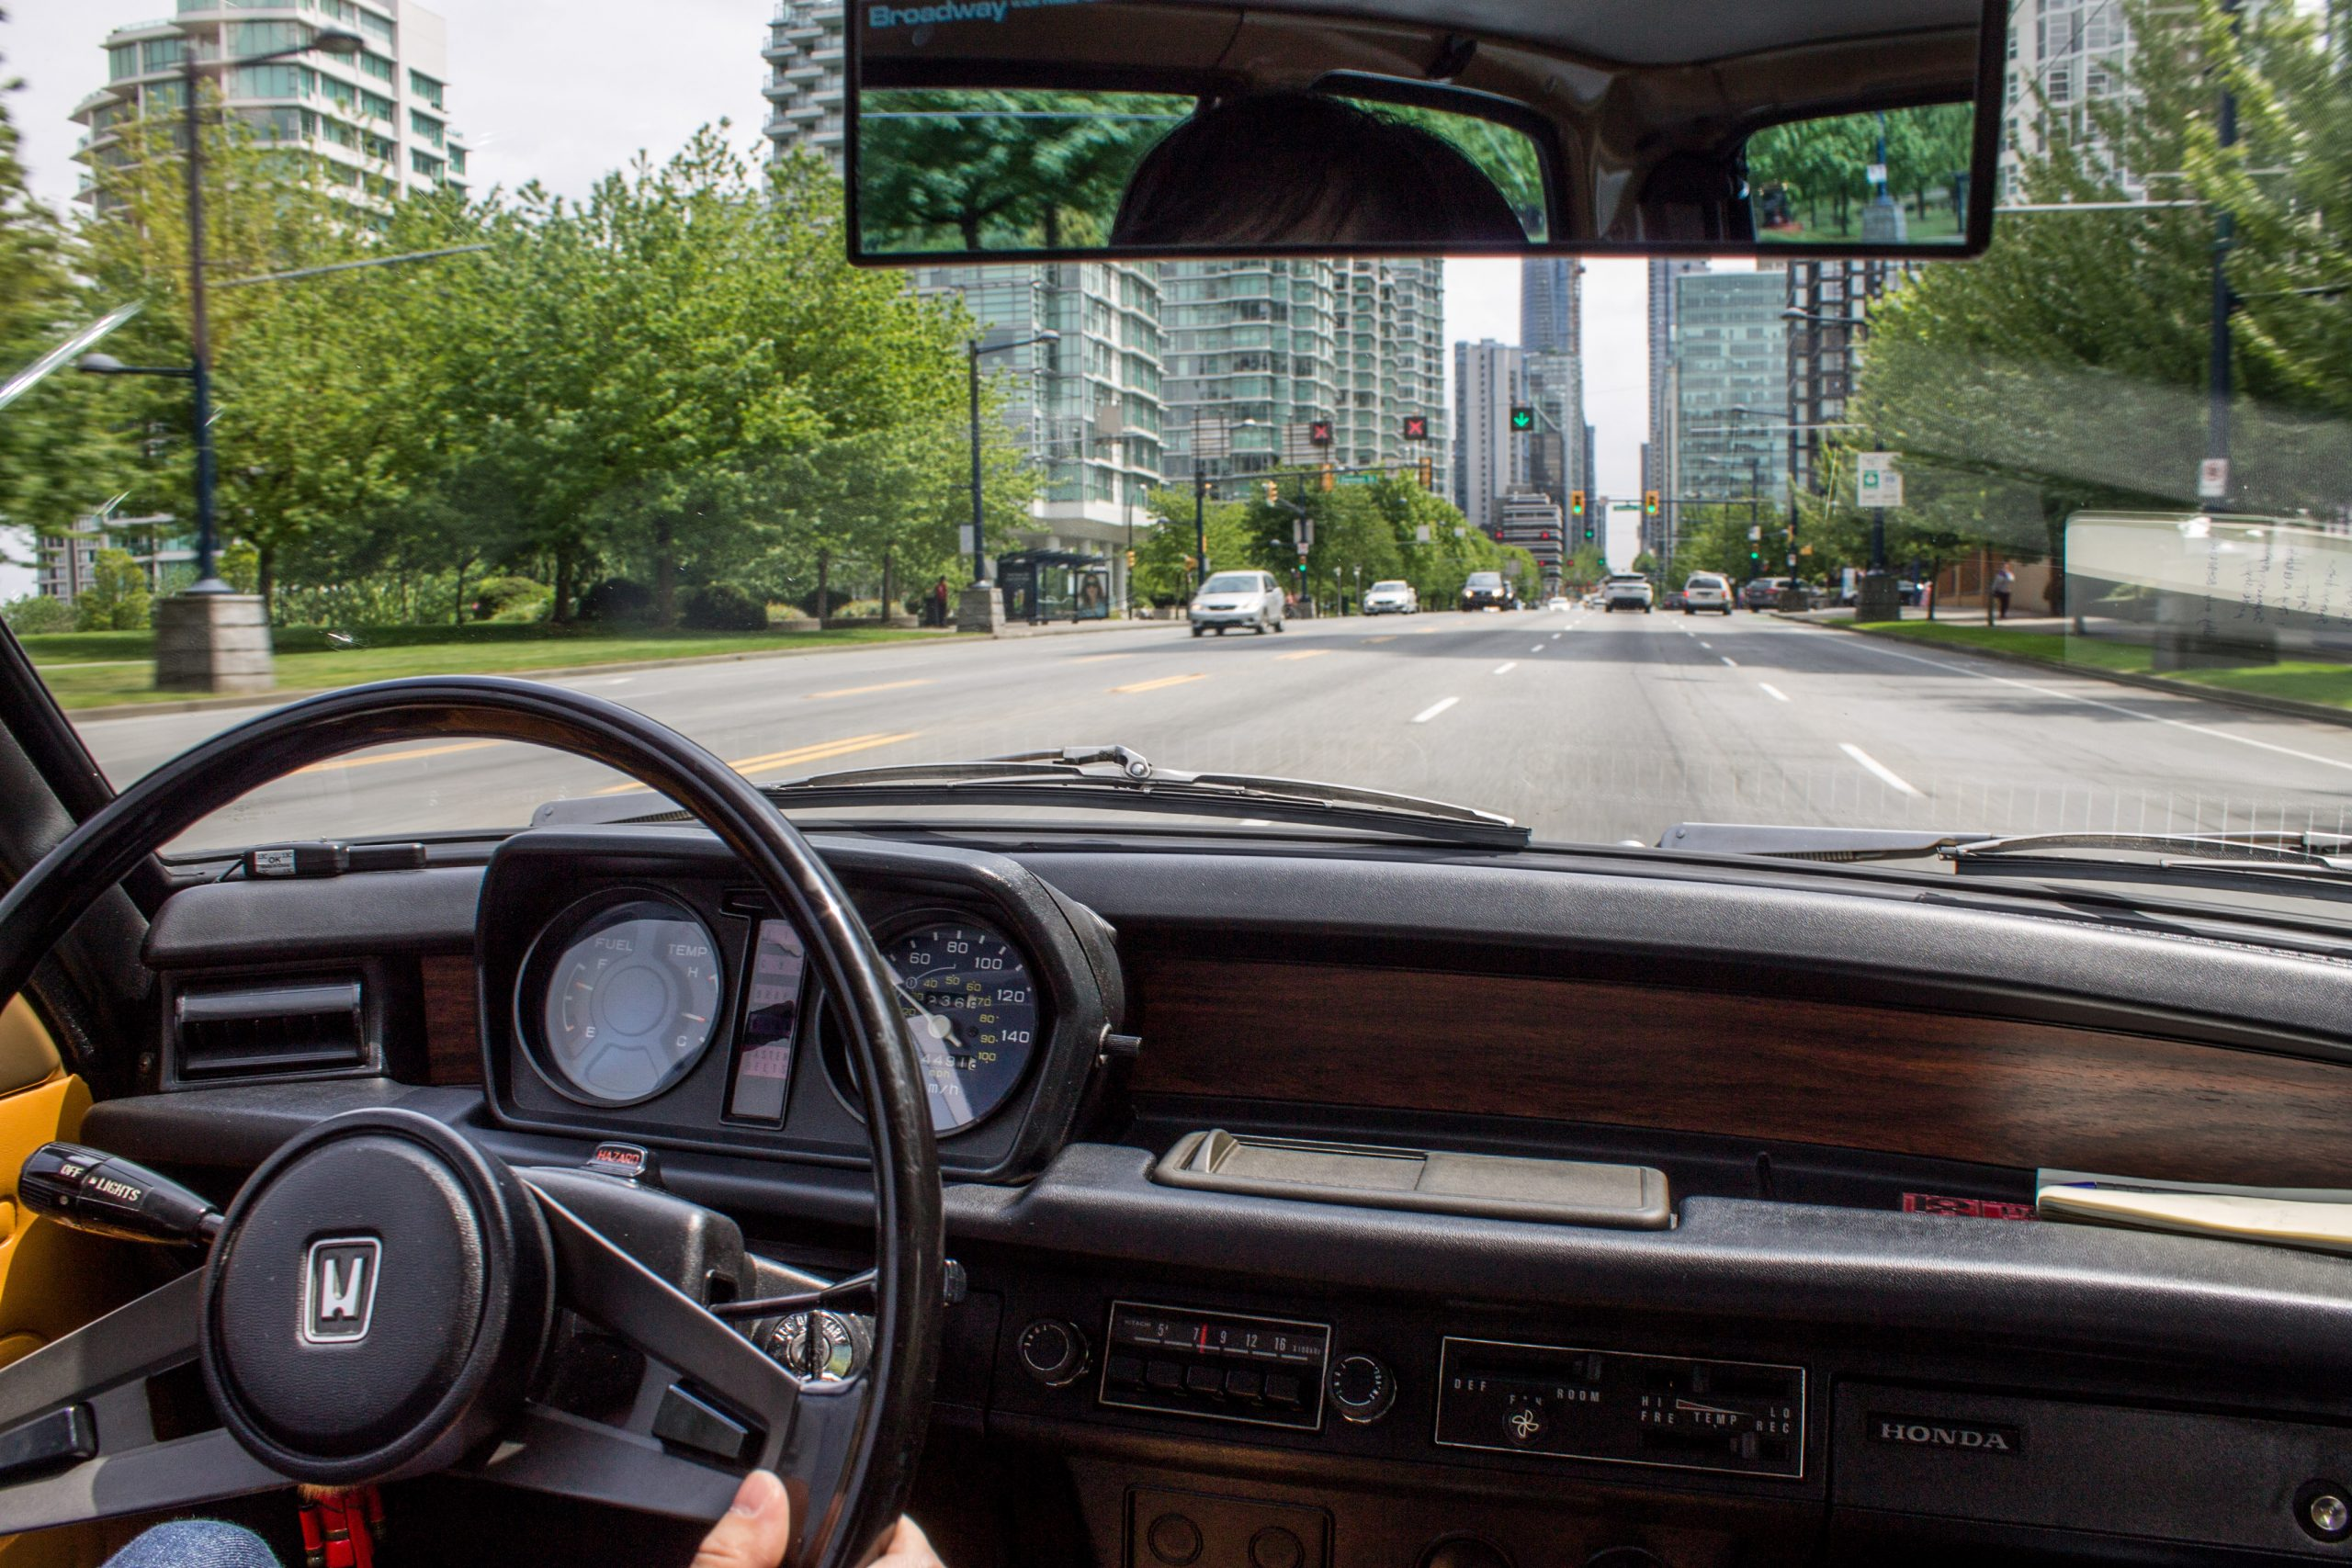 1977 Honda Civic Hatchback Interior Front Action